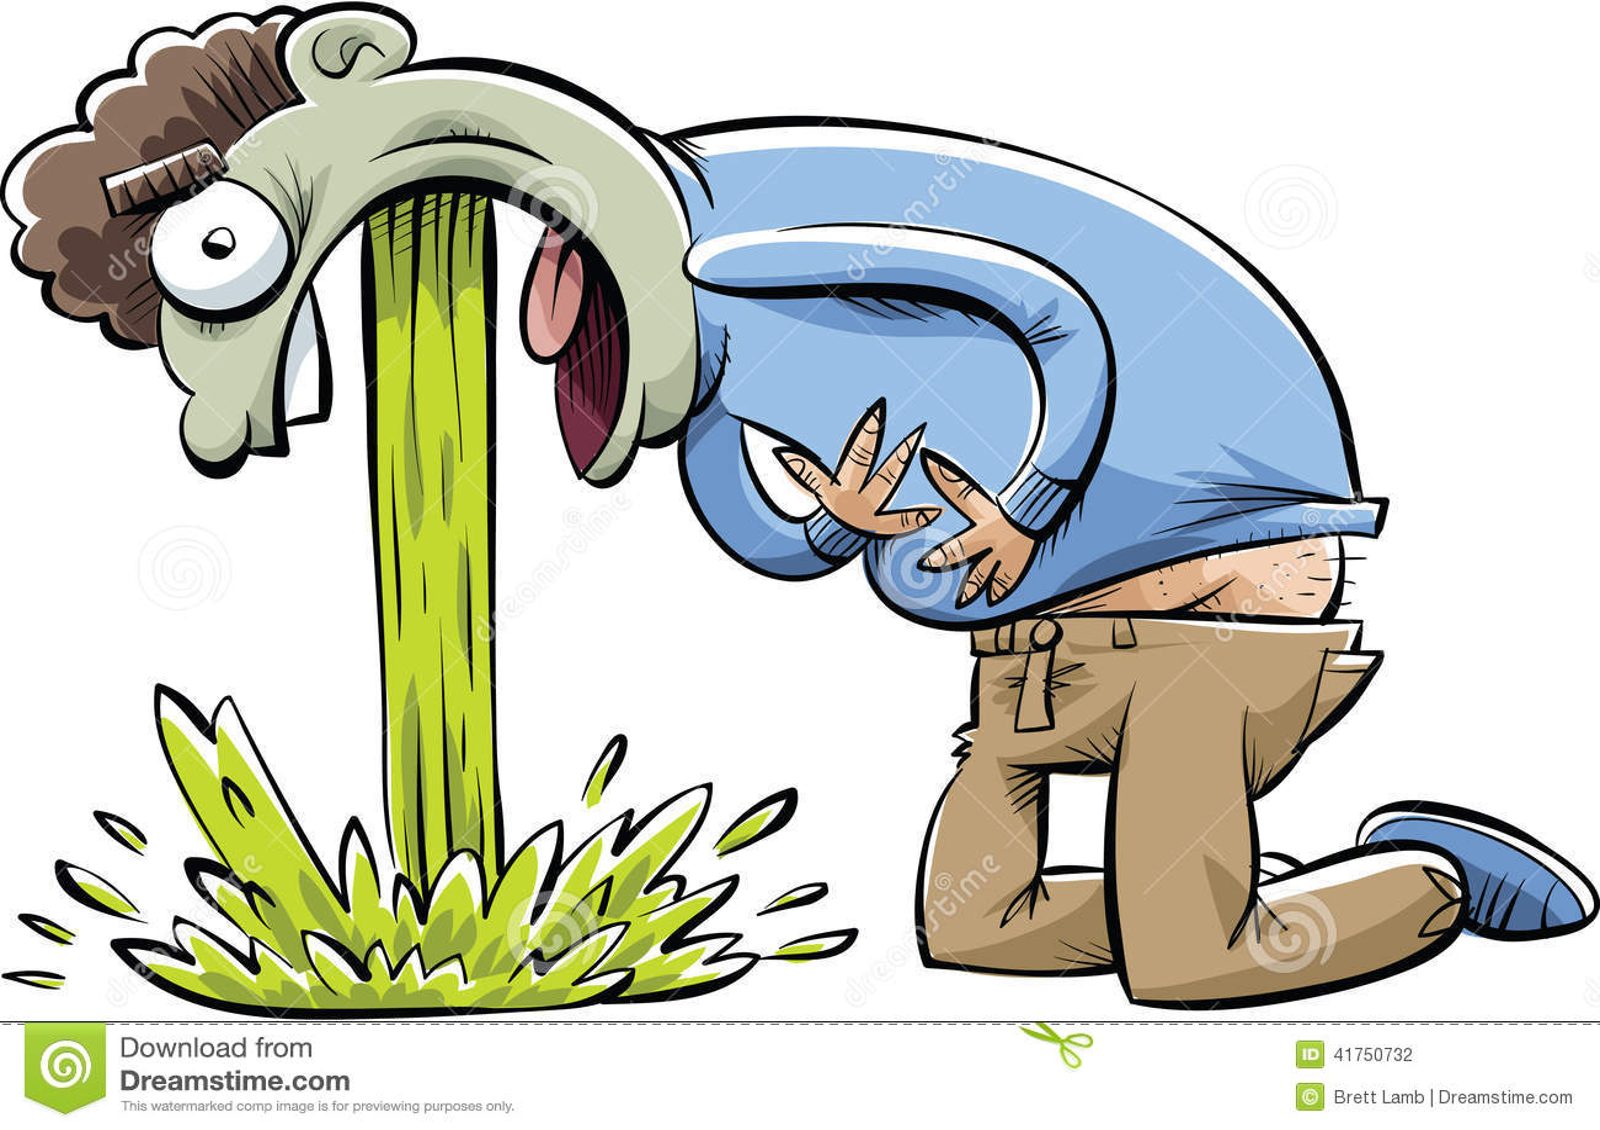 painful-puke-cartoon-man-pain-as-vomits-41750732